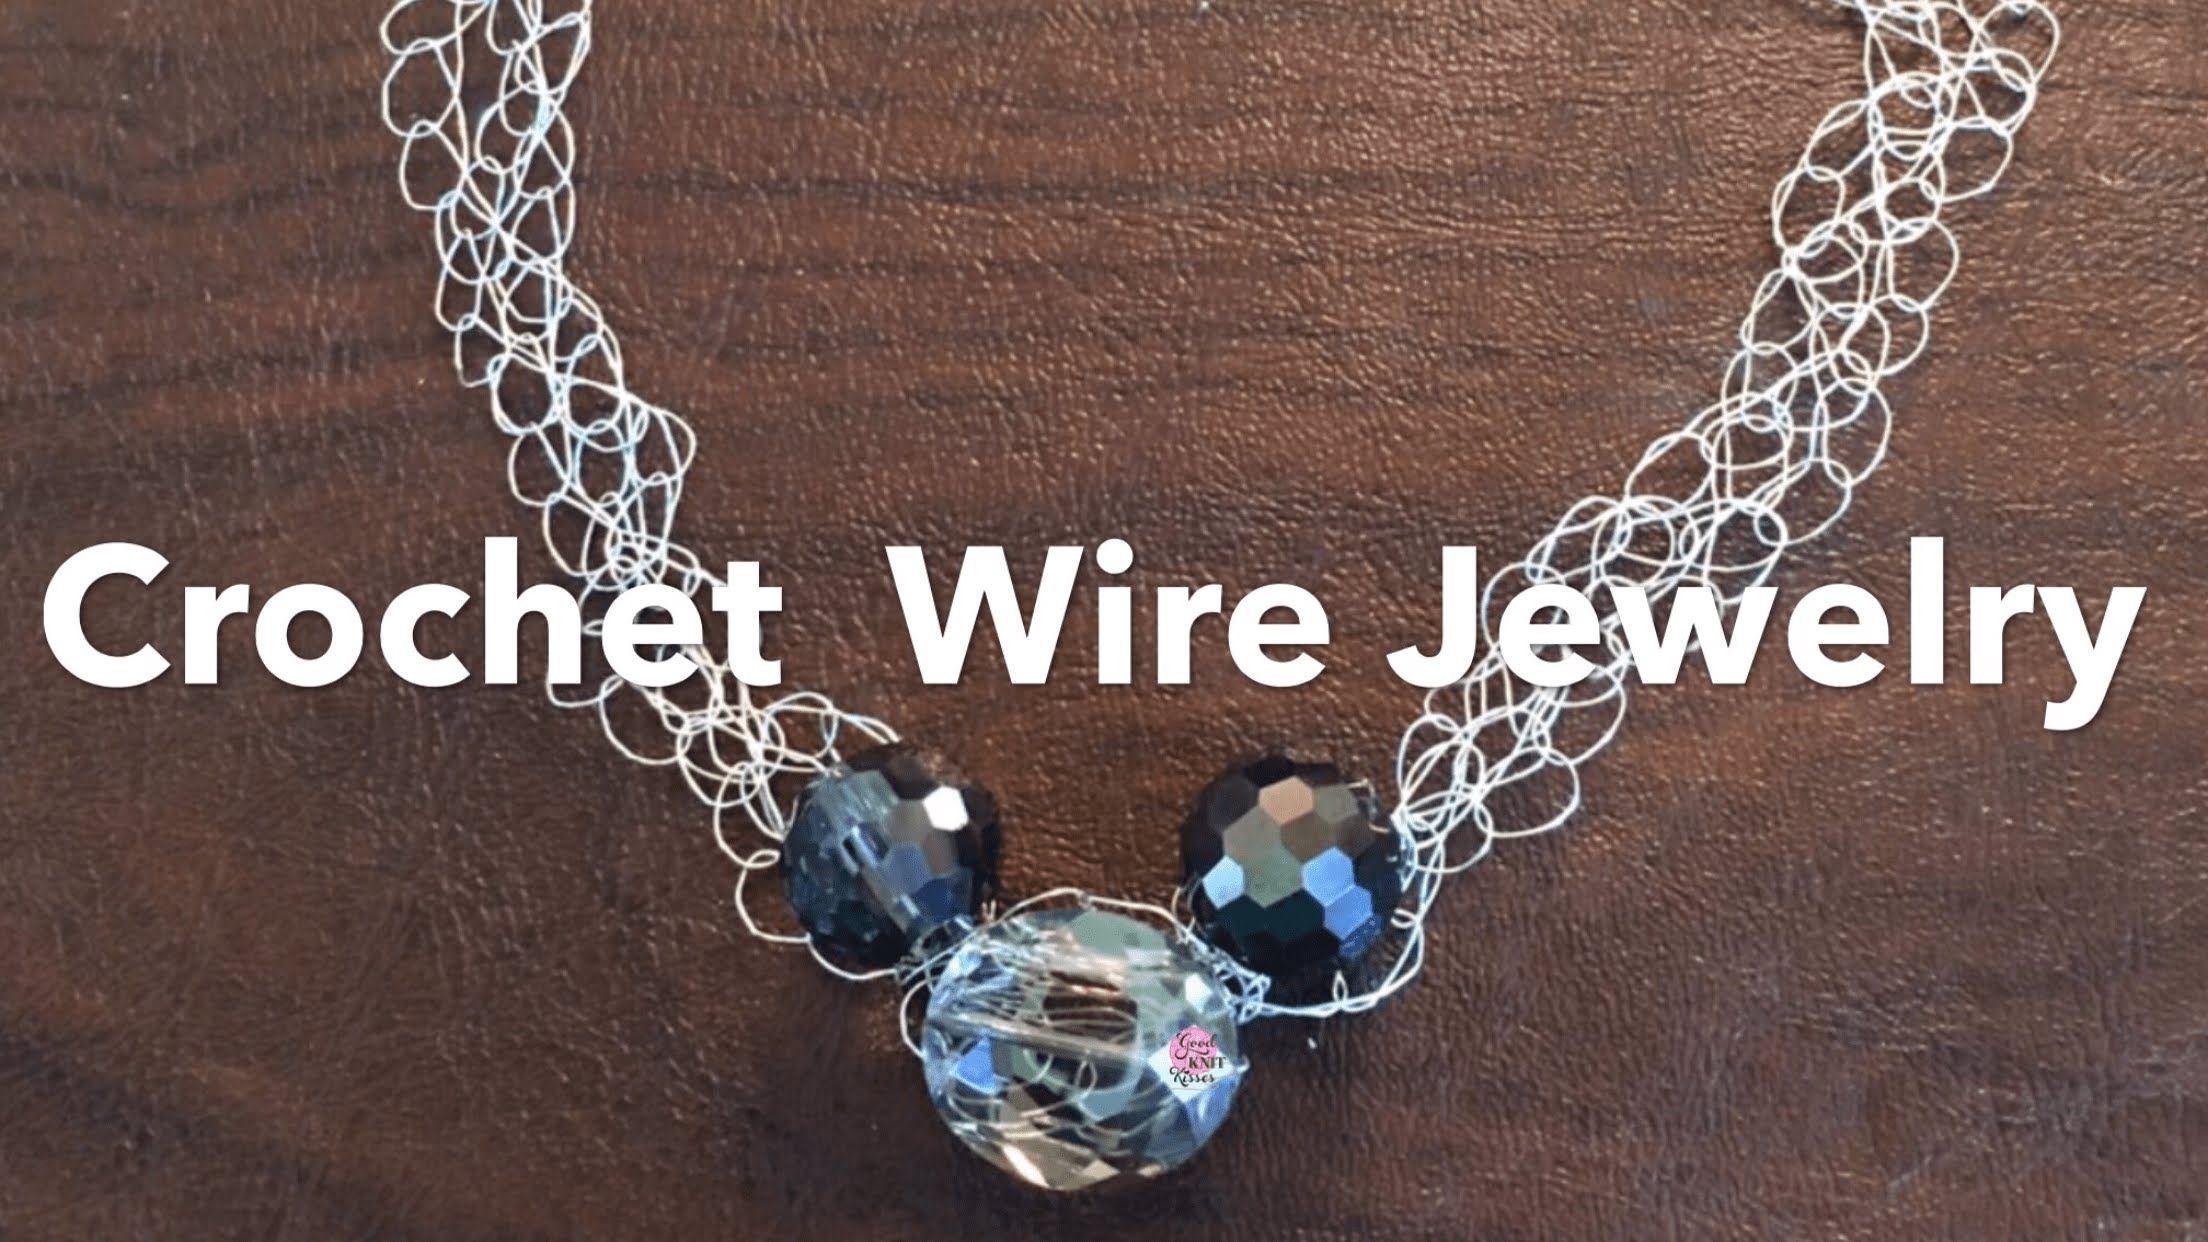 Crochet Wire Jewelry | Crochet wire jewelry... | Pinterest | Crochet ...